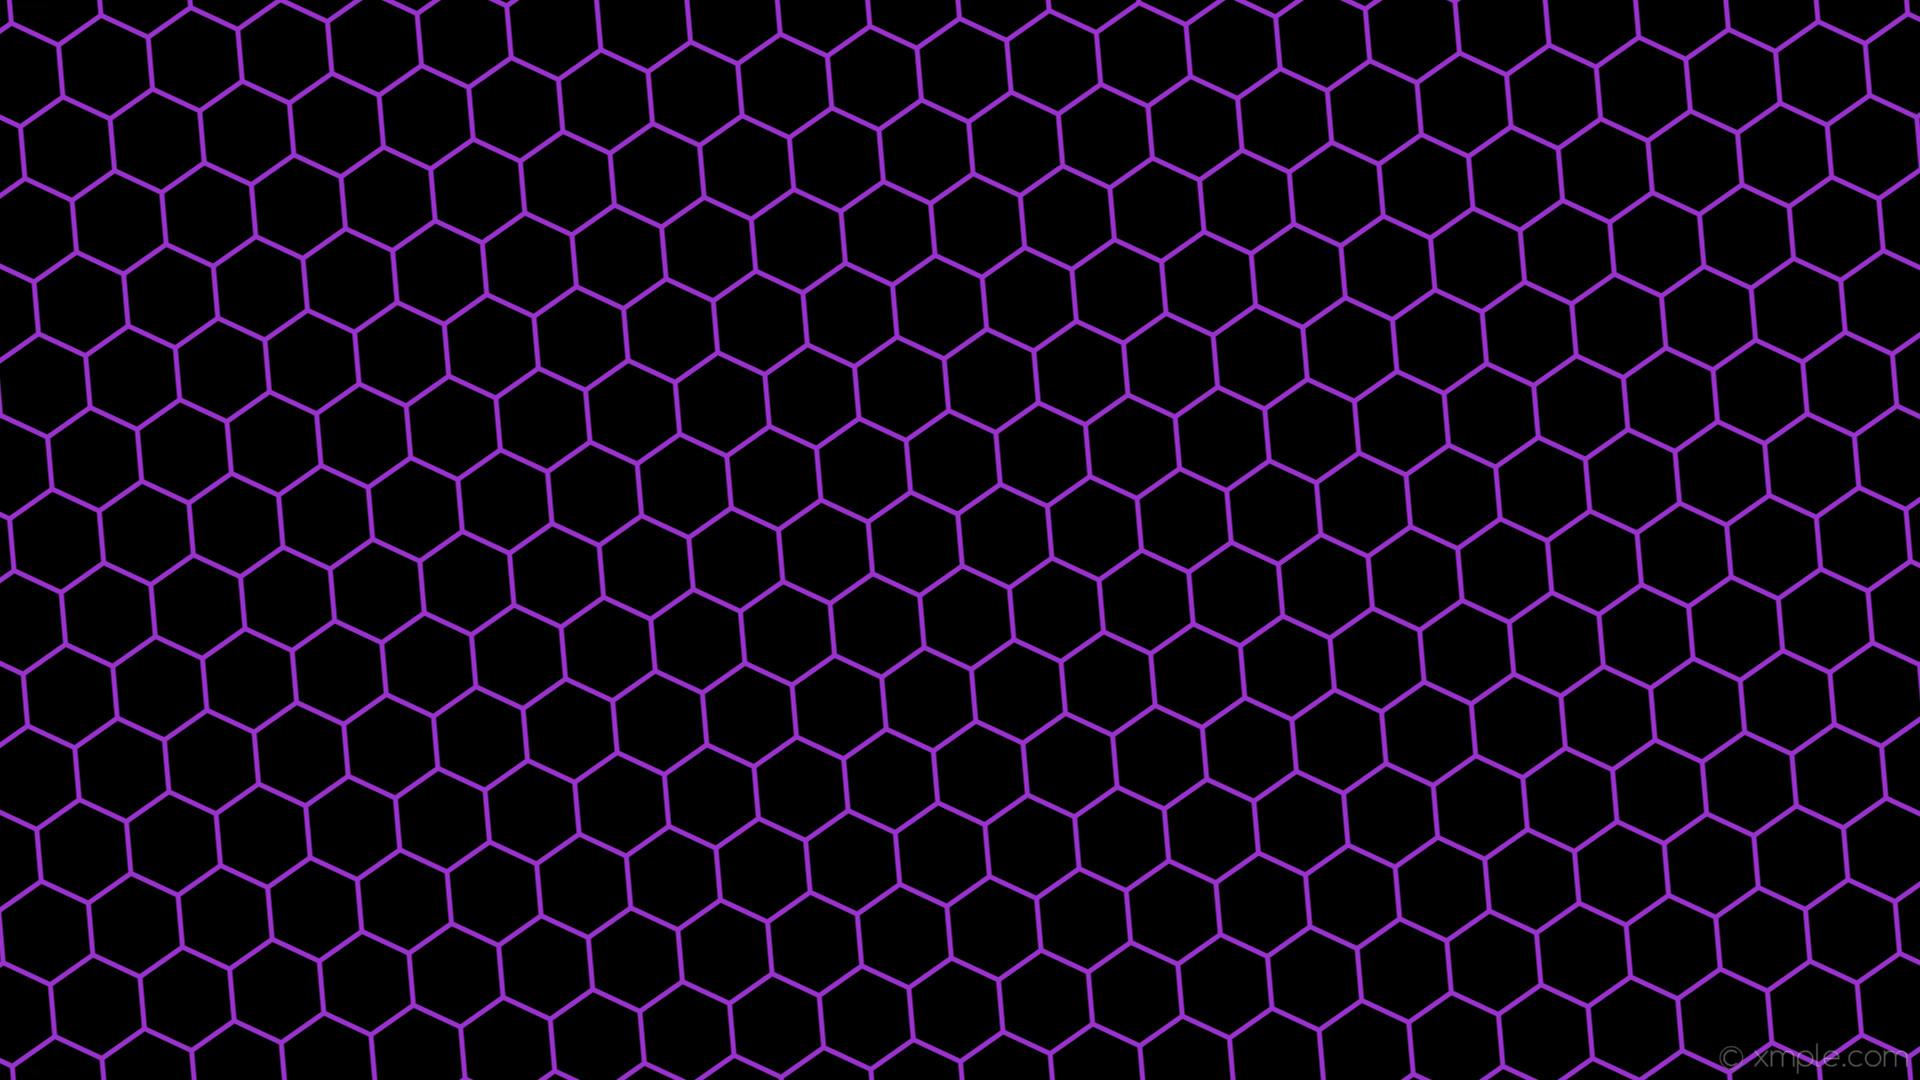 wallpaper beehive black honeycomb purple hexagon dark orchid #000000  #9932cc diagonal 5° 5px